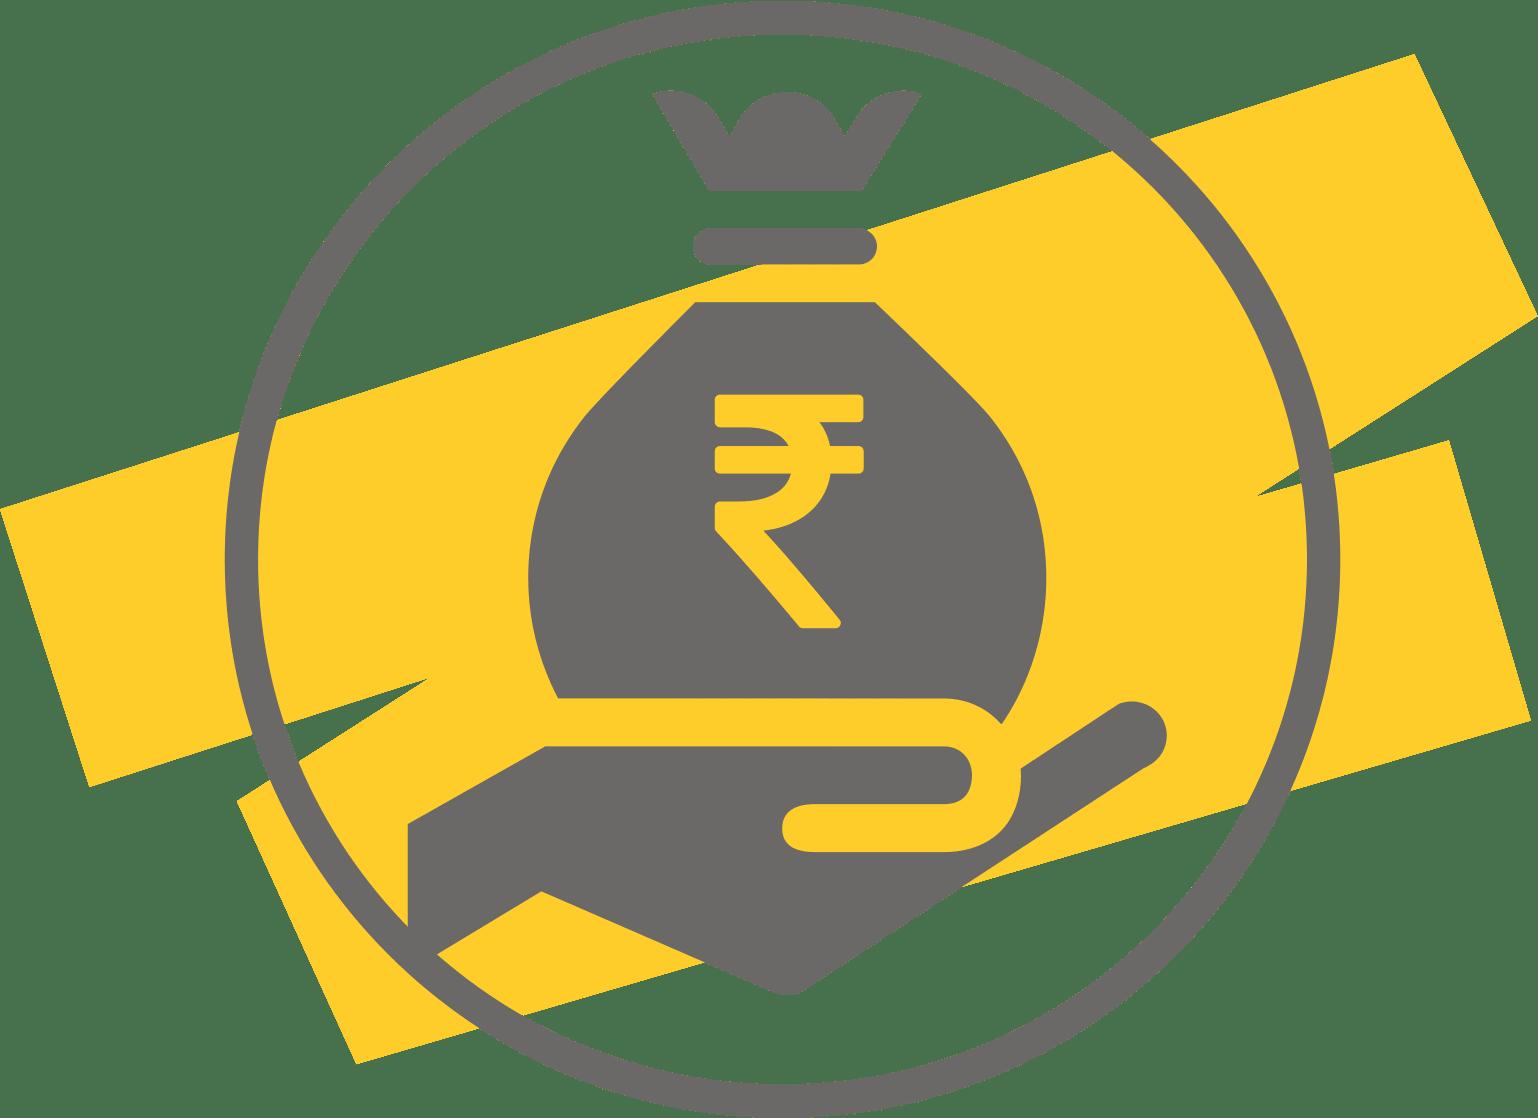 Best Value for Money with Alliggo Car Rentals